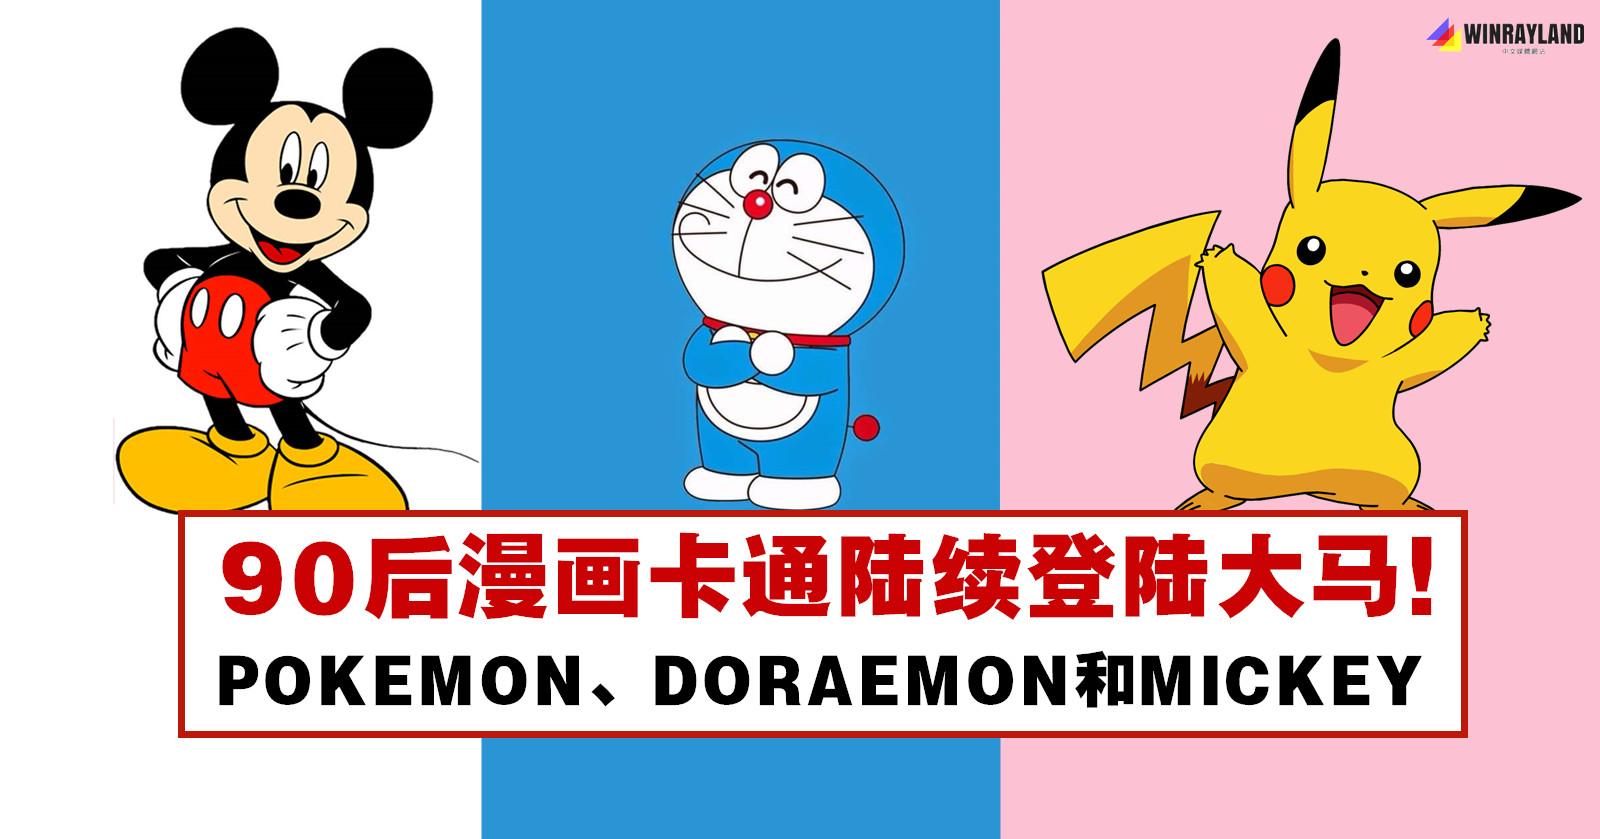 POKEMON、DORAEMON和MICKEY陆续登陆大马!